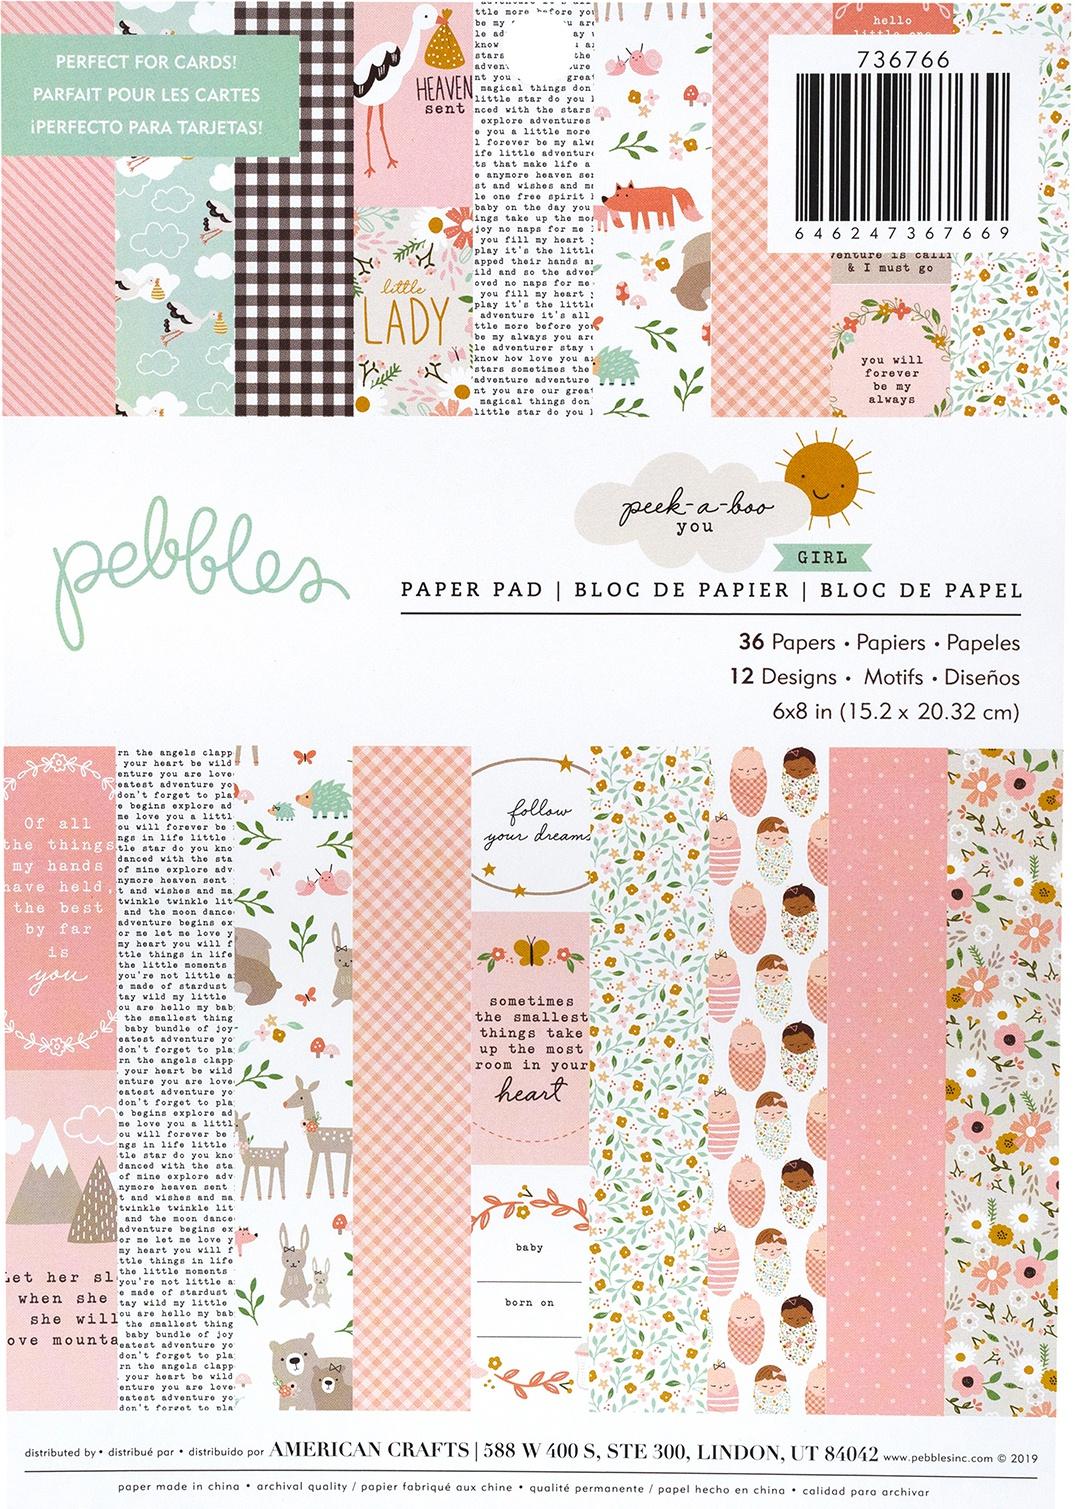 Pebbles Peek-a-Boo You - 6x8 Paper Paper Pad, Girl